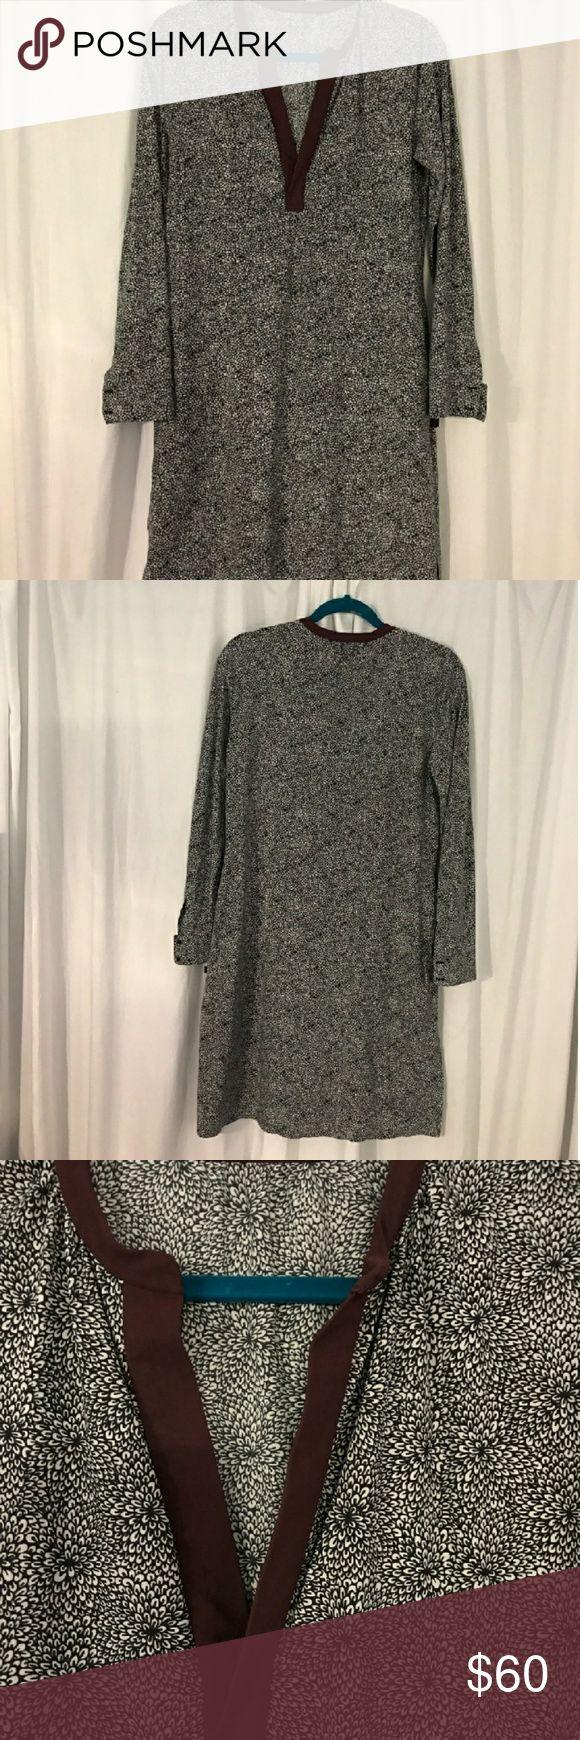 Lululemon Dress Size 8 Never worn lululemon athletica Dresses